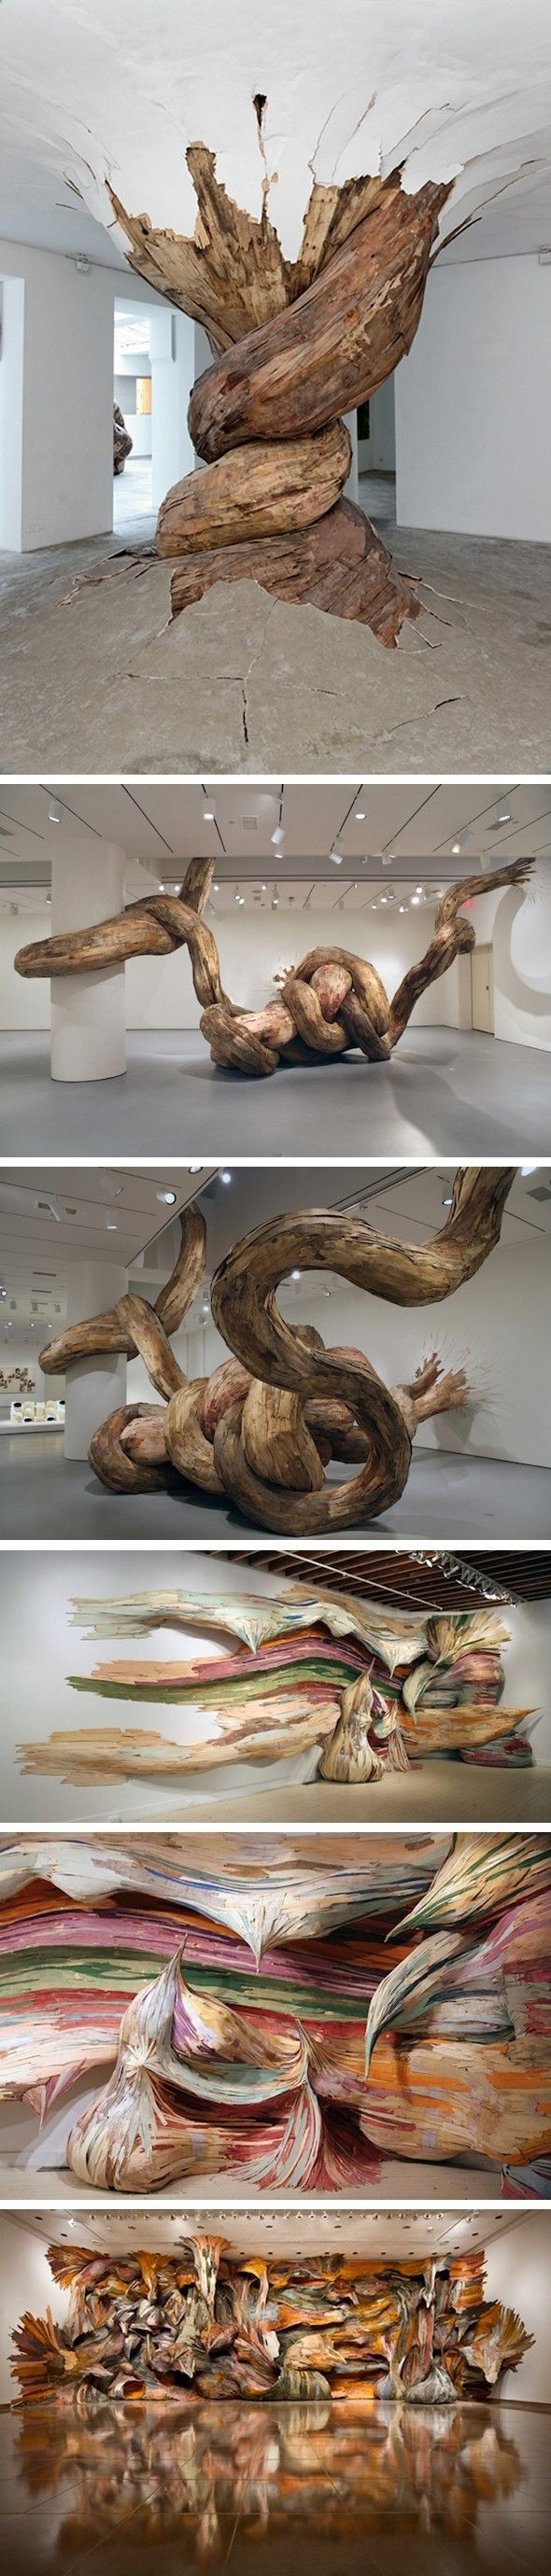 Incroyables sculptures en bois par Henrique Oliveira - Journal du Design